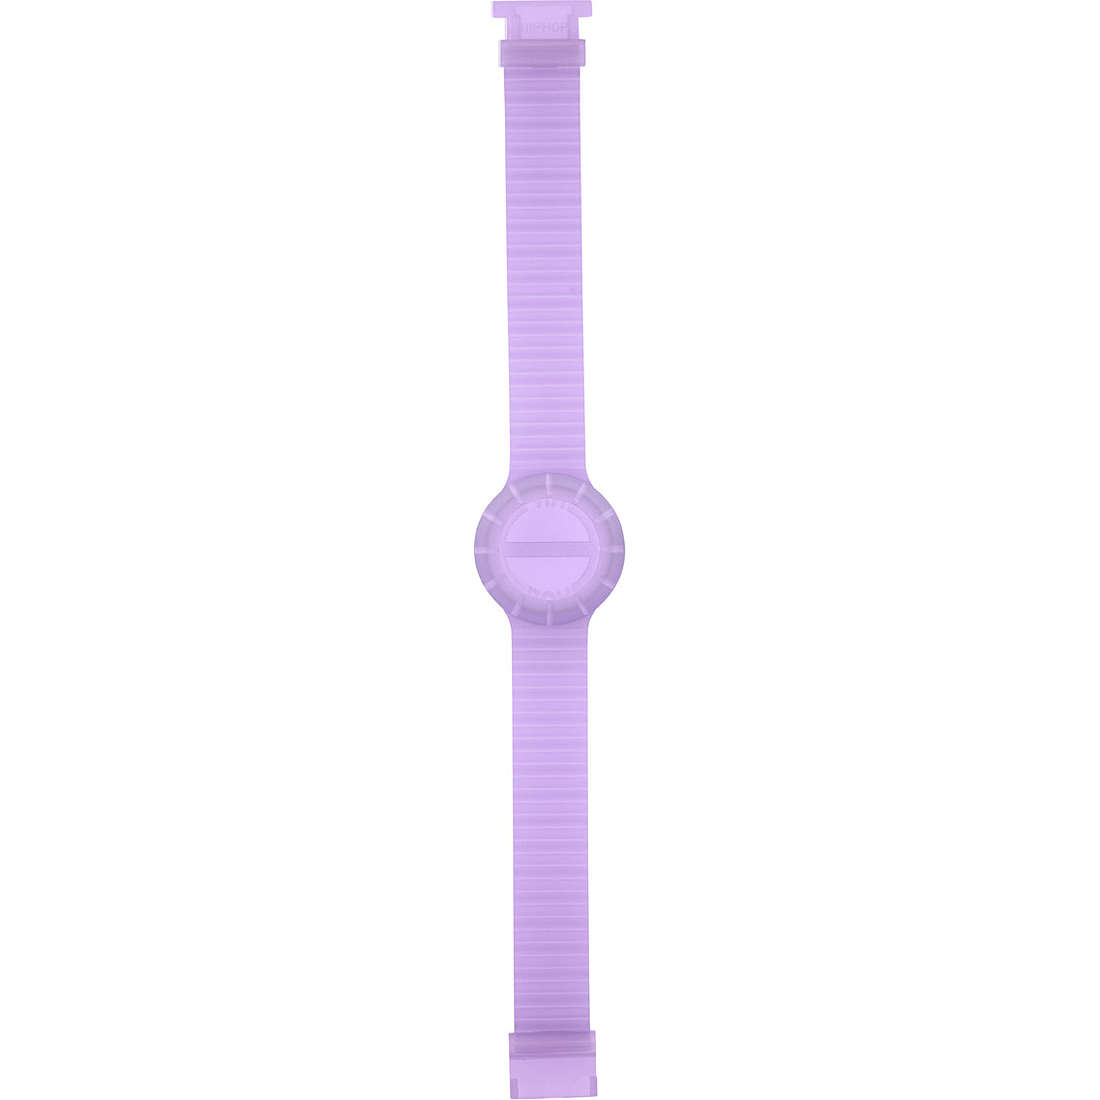 orologio accessorio unisex Hip Hop HBU0098